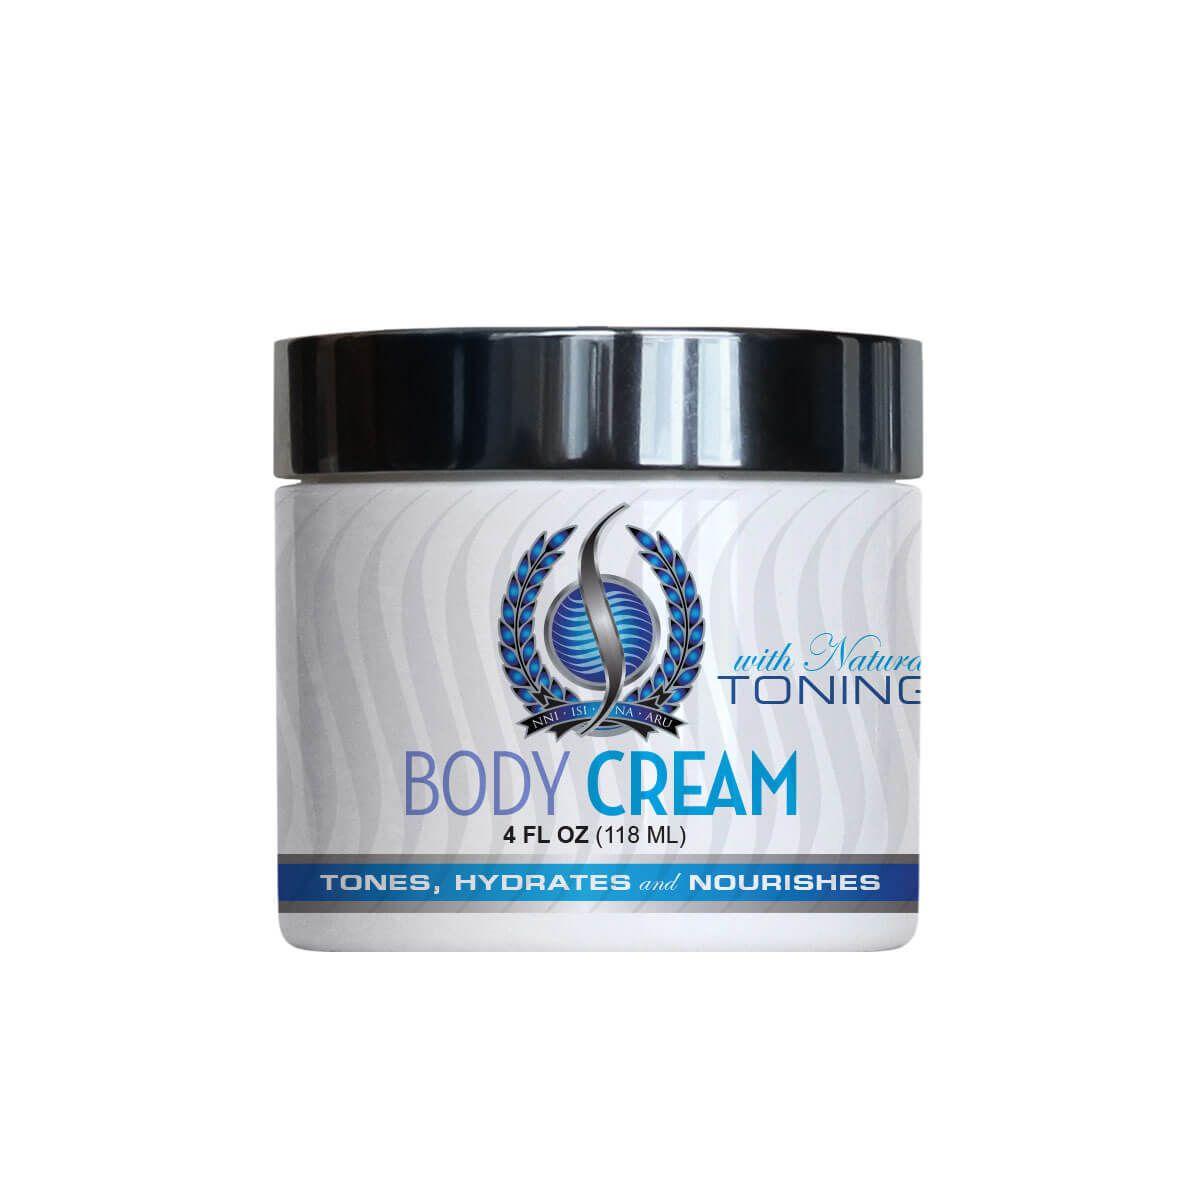 BoBody Cream with Natural Toning 4oz Shinkafa Face